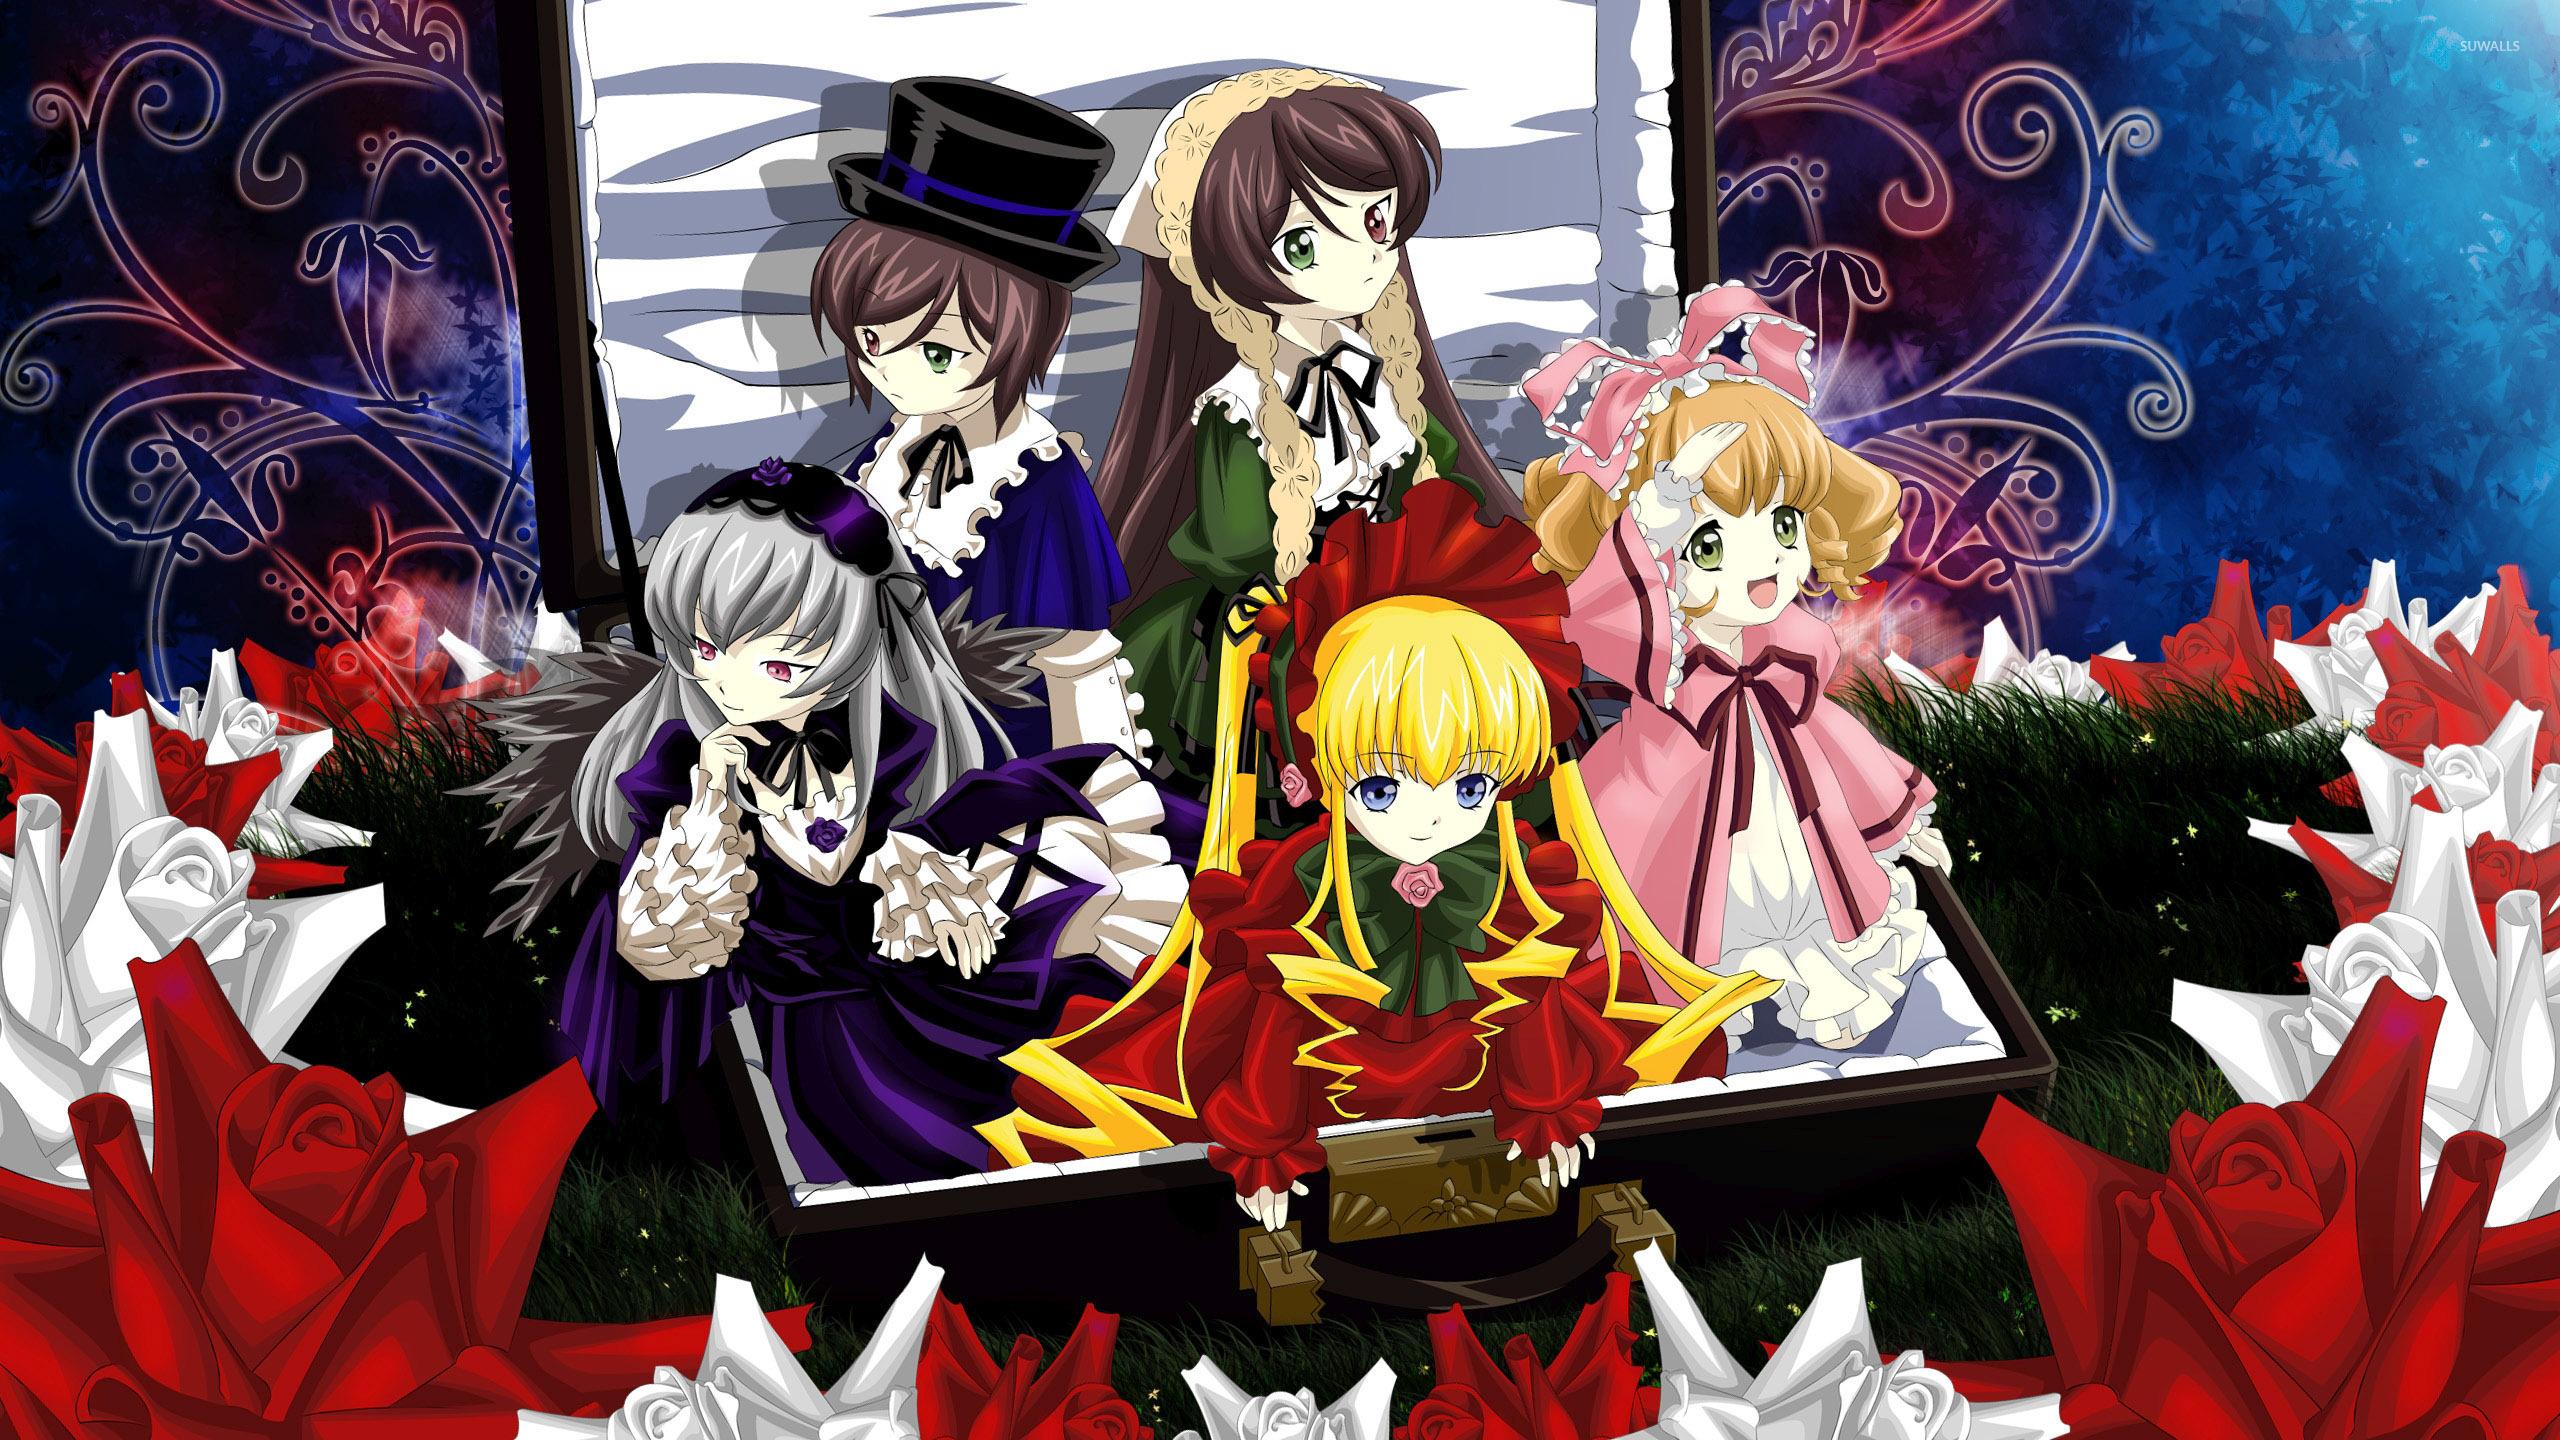 Rozen Maiden Wallpaper  Anime Wallpapers 34438